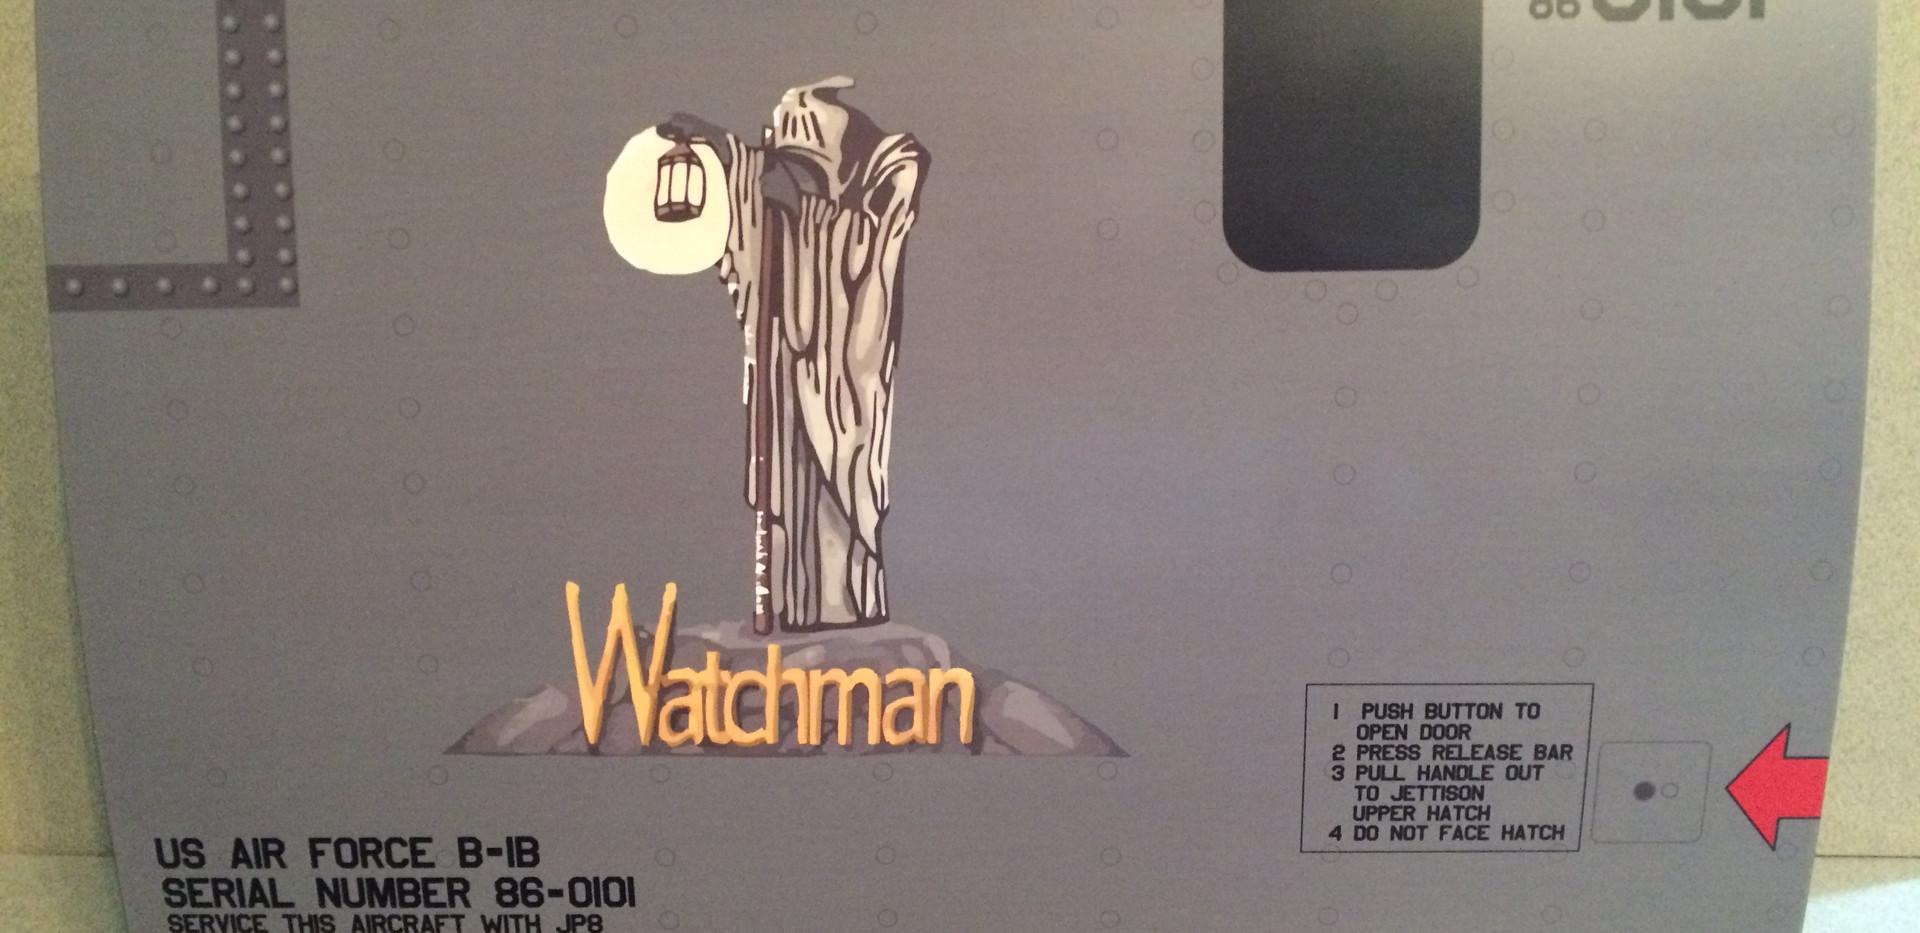 B-1 Watchman